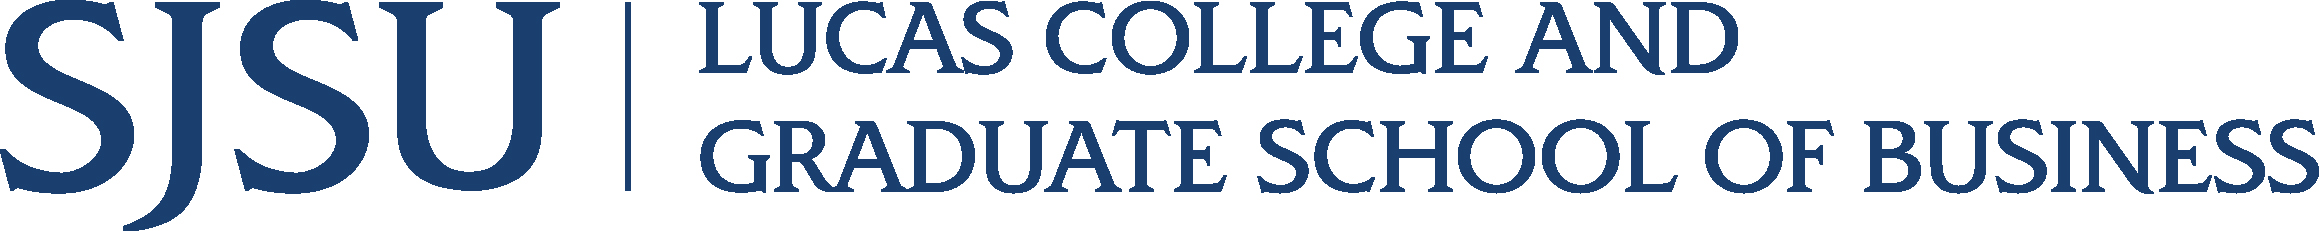 SJSU Lucus College and Graduate School of Business